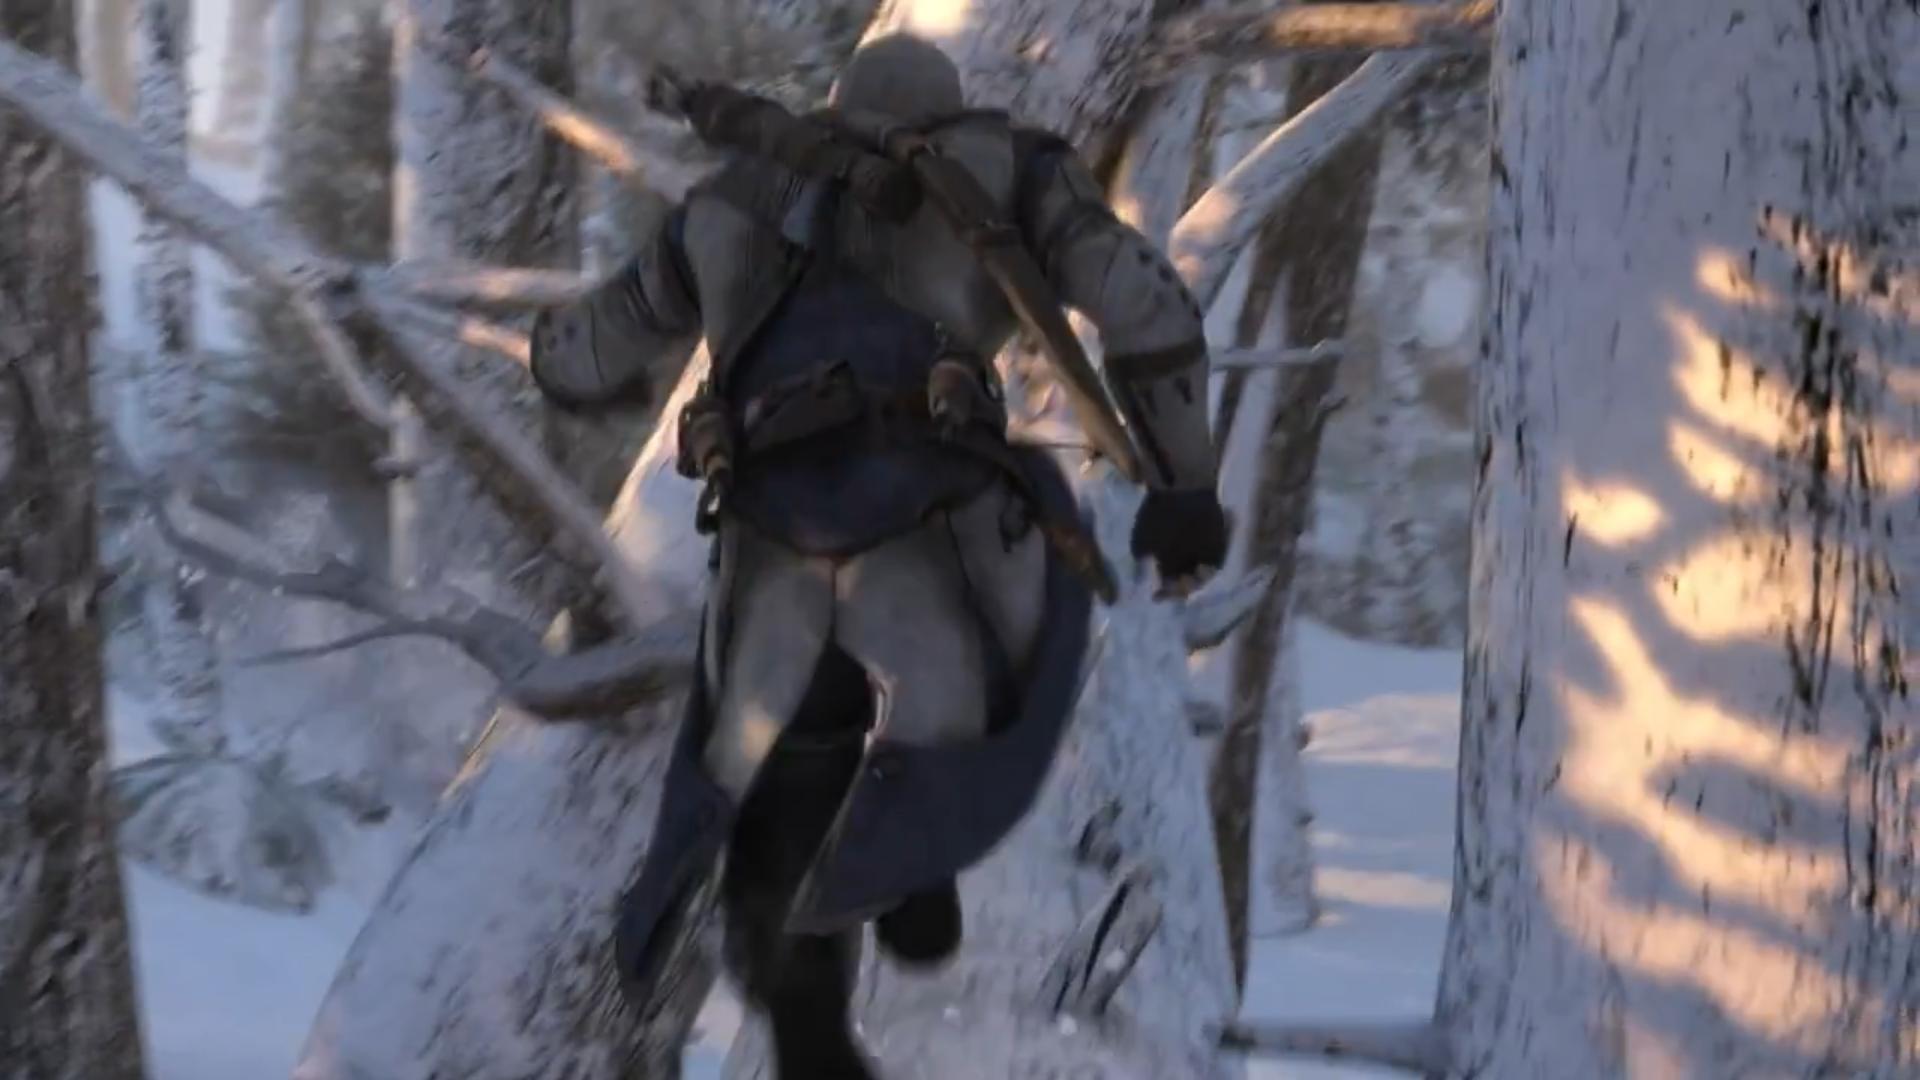 Assassin's Creed 3 - Rozbor prvního traileru 61681